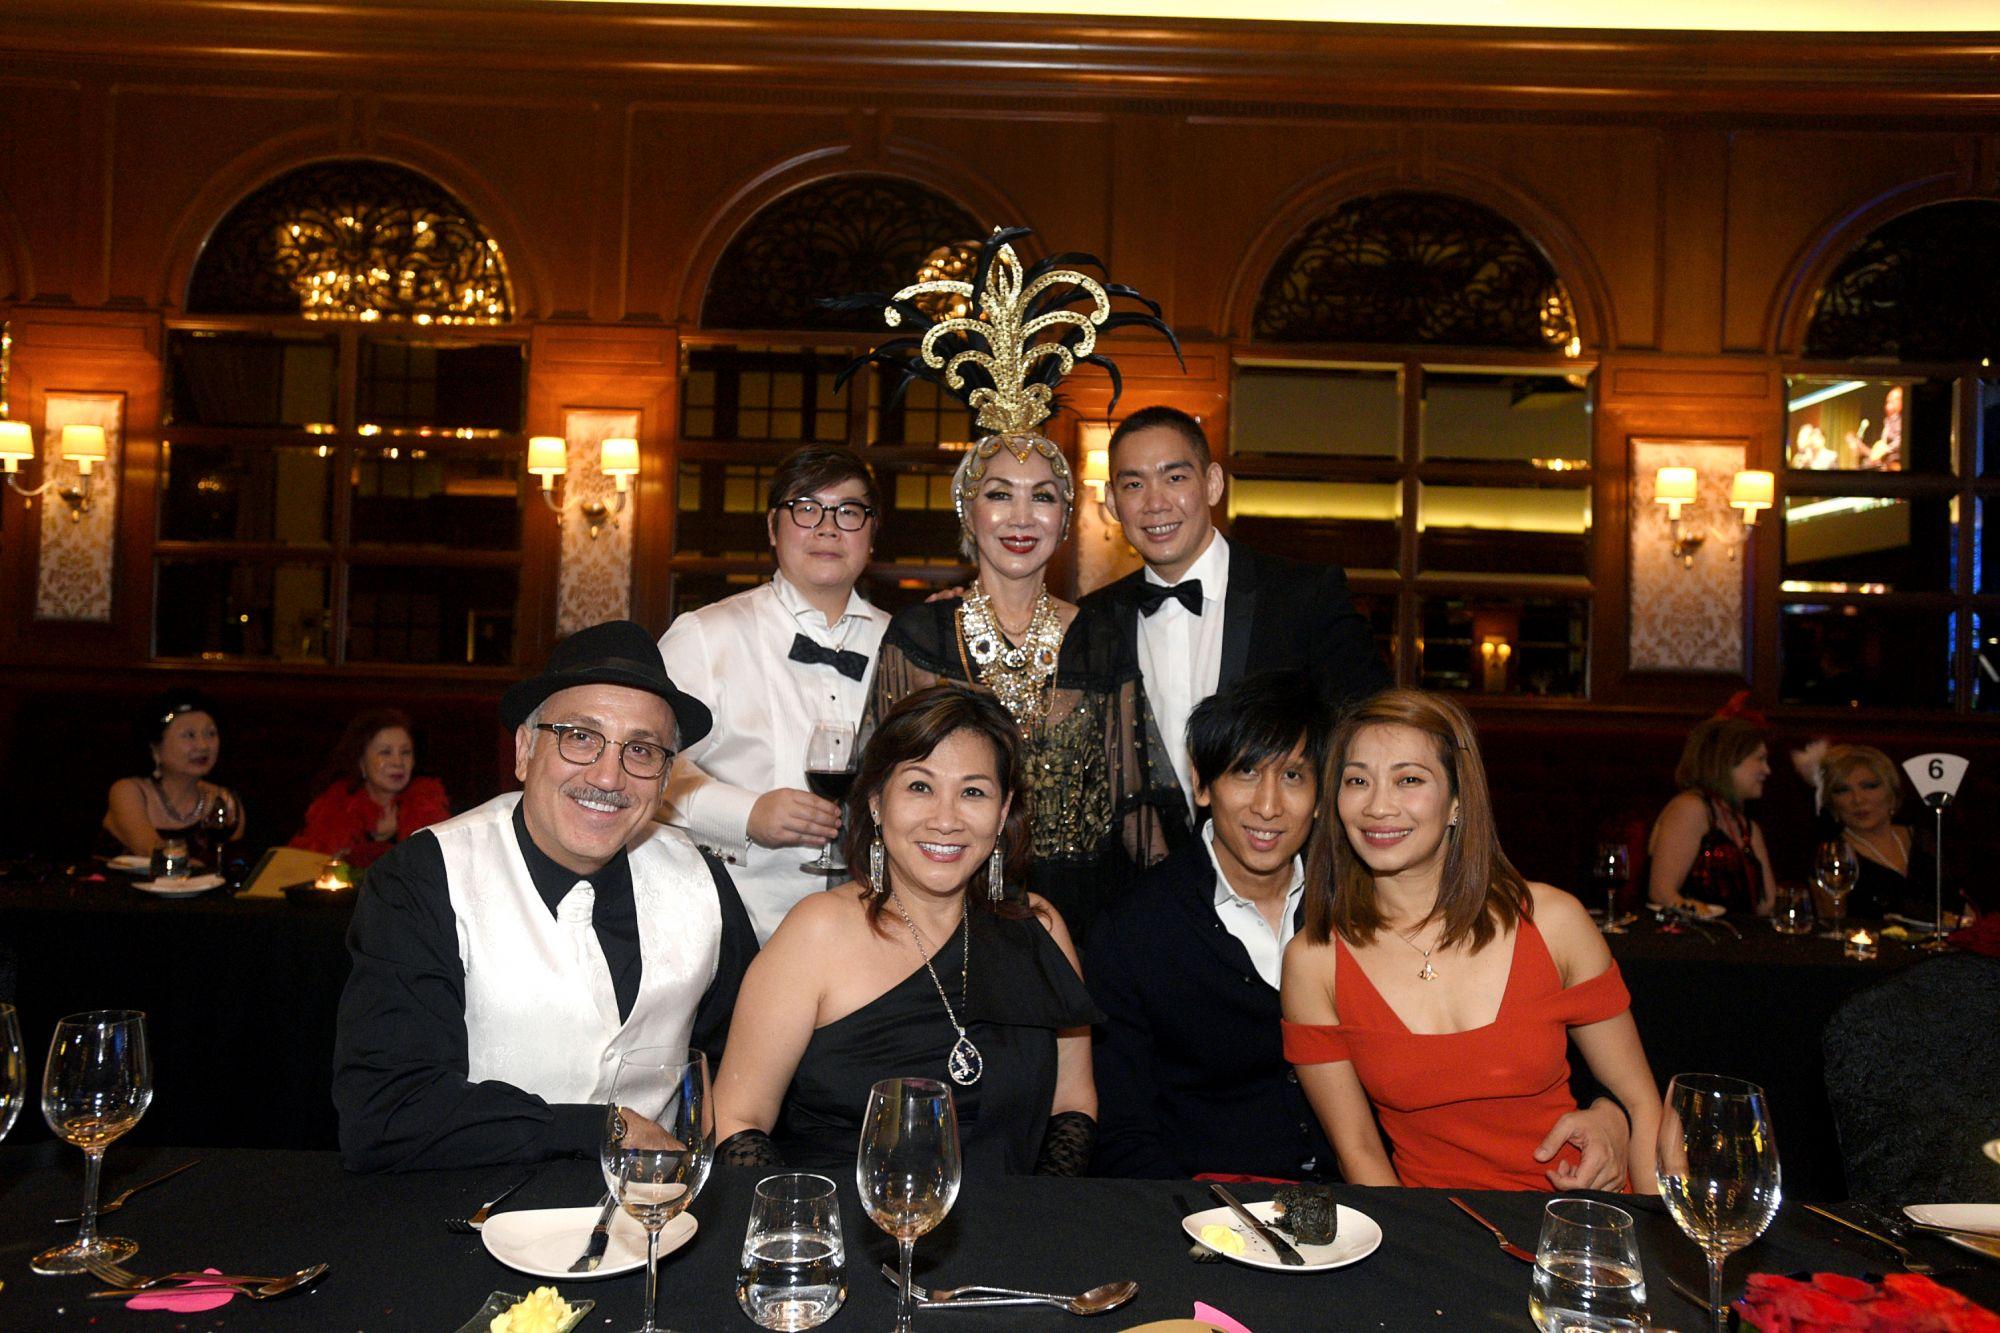 Jean Nasr, Marisa Teo, Pauline Chan, Peggy Jeffs, Richmond Teo, Damien Low, Corinne Ng